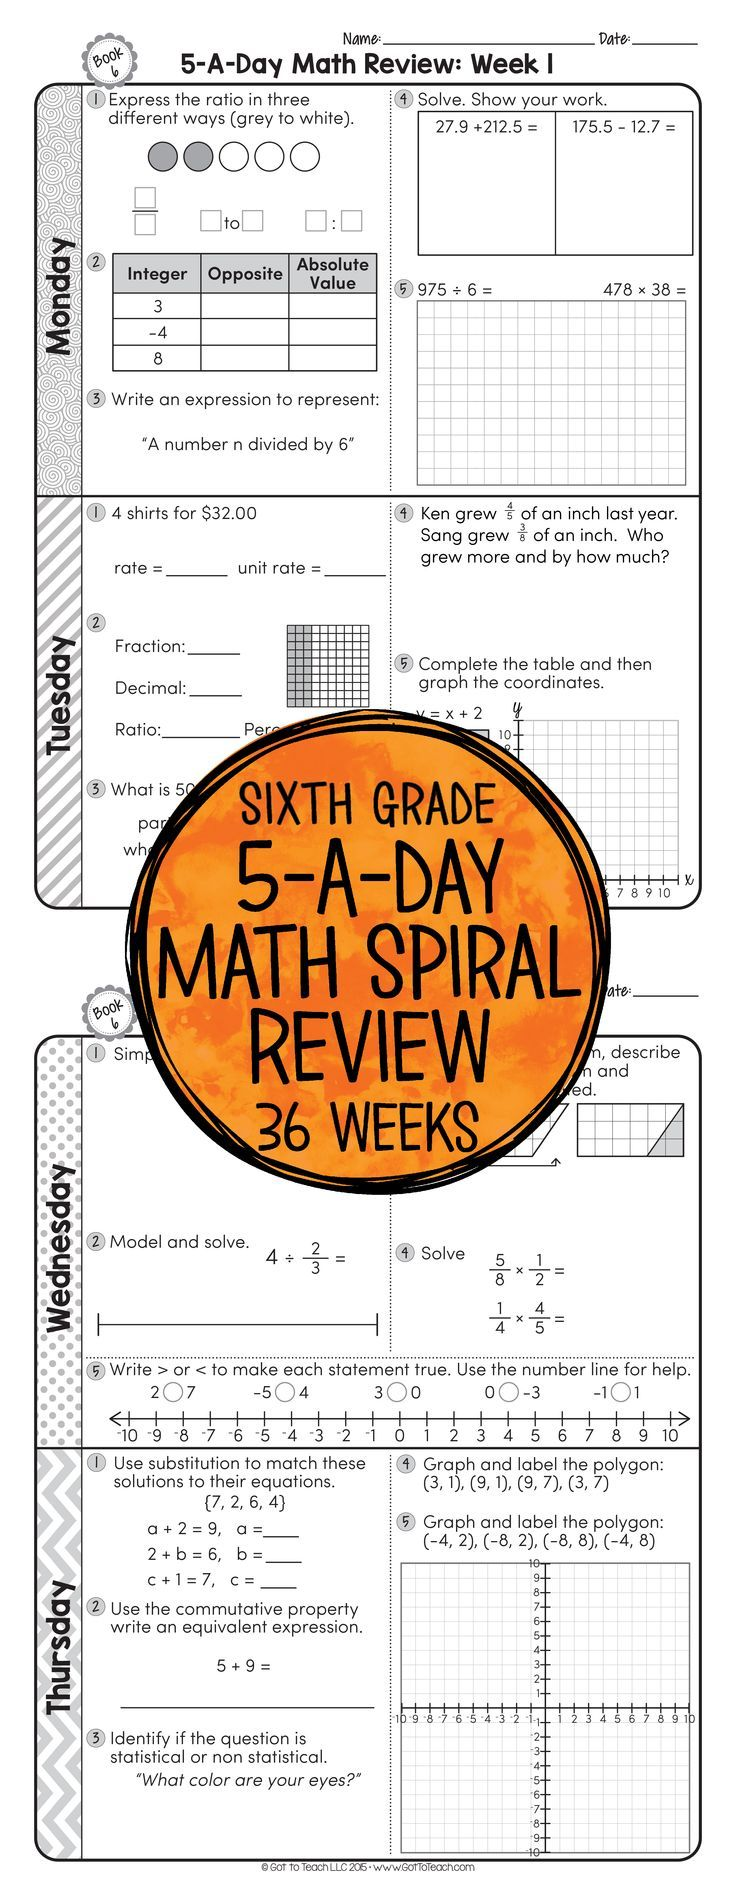 6th Grade Daily Math Spiral Review   Daily math [ 1904 x 736 Pixel ]